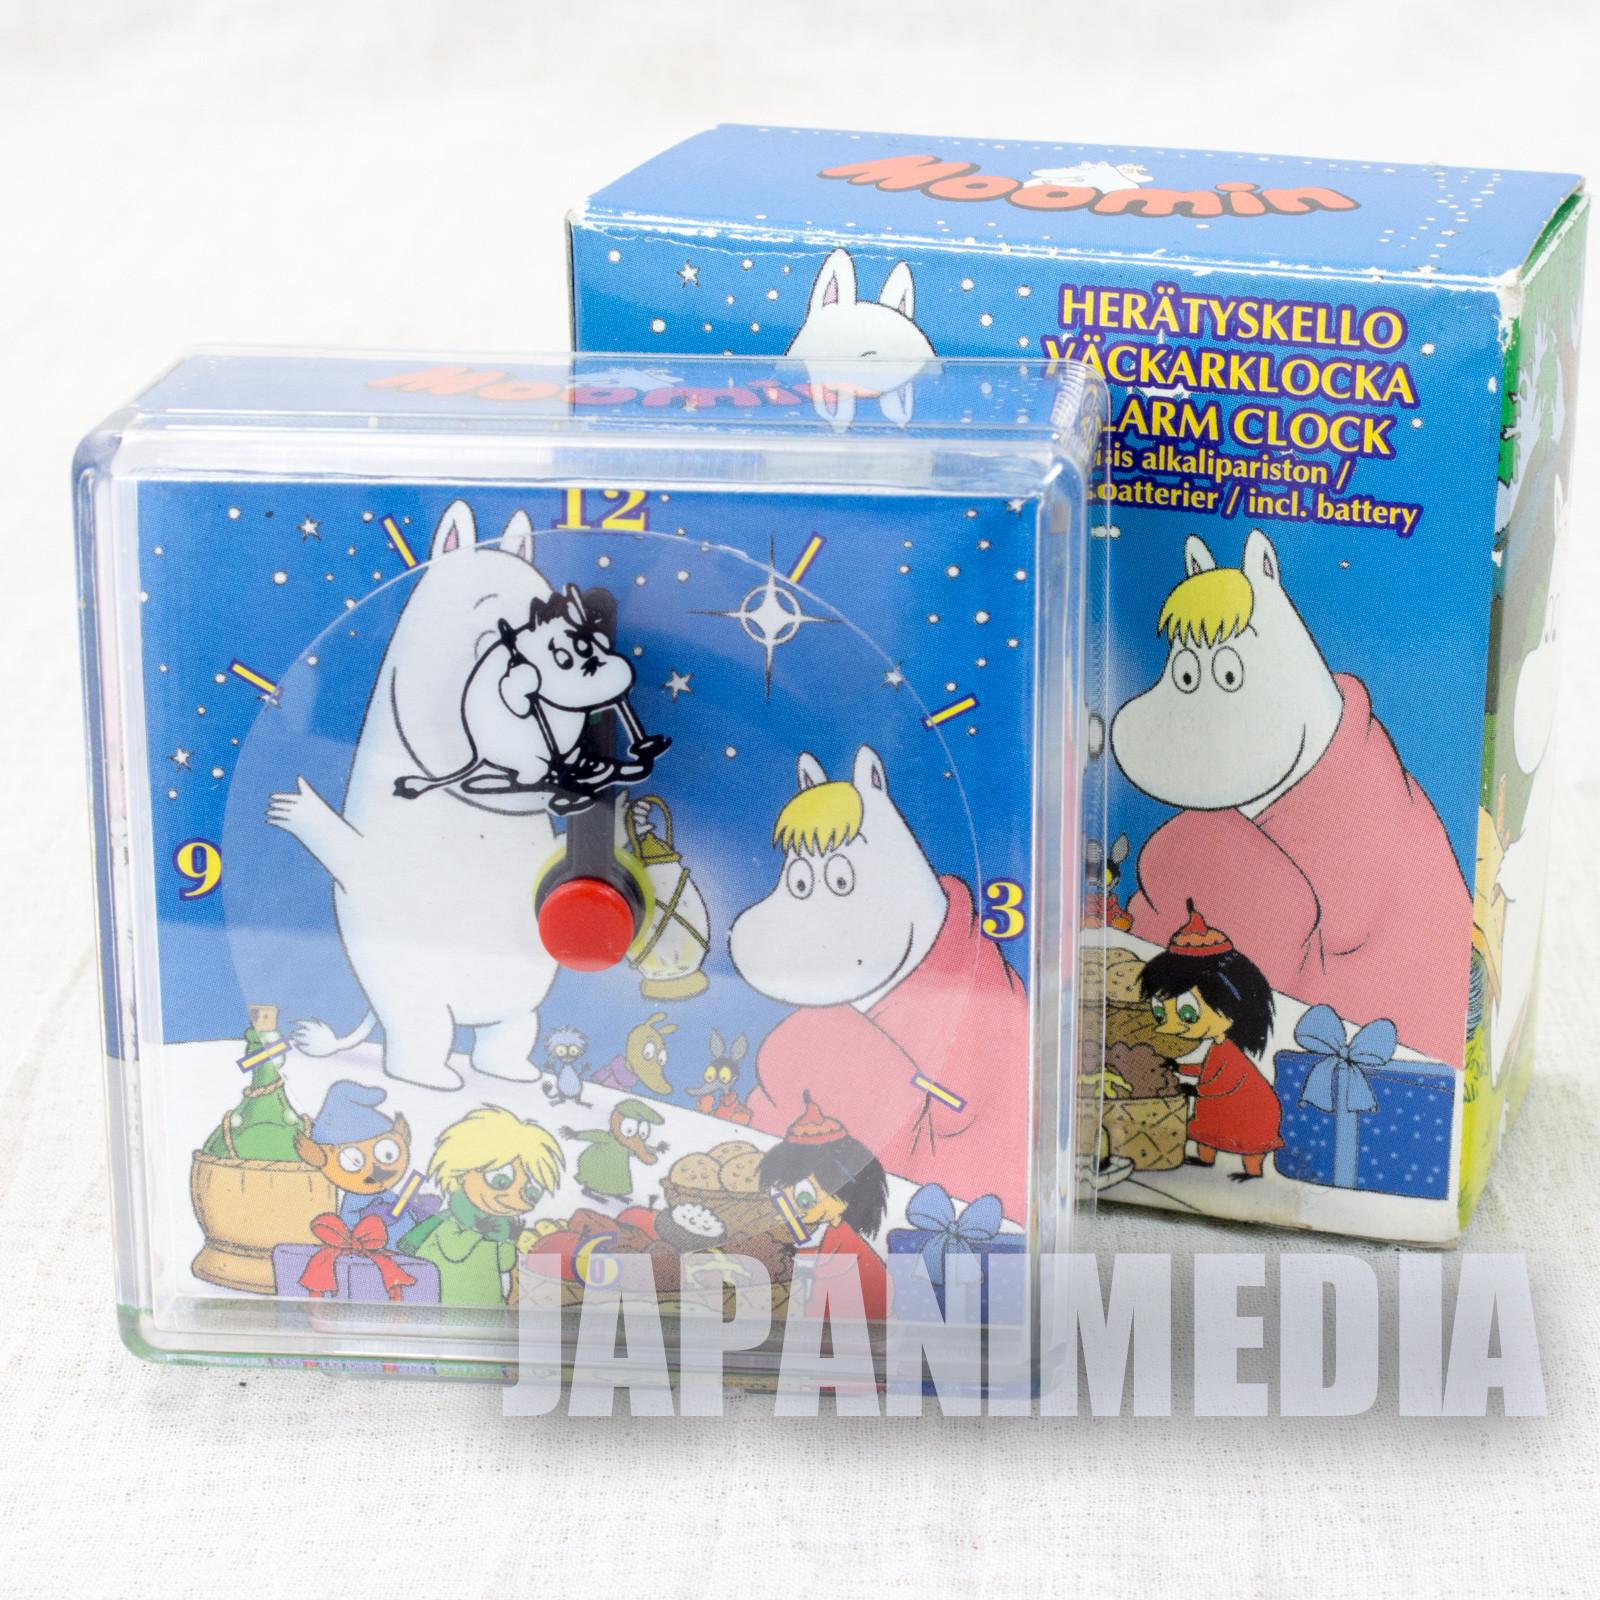 RARE!! Moomin Mini Alarm Clock Tove Janson